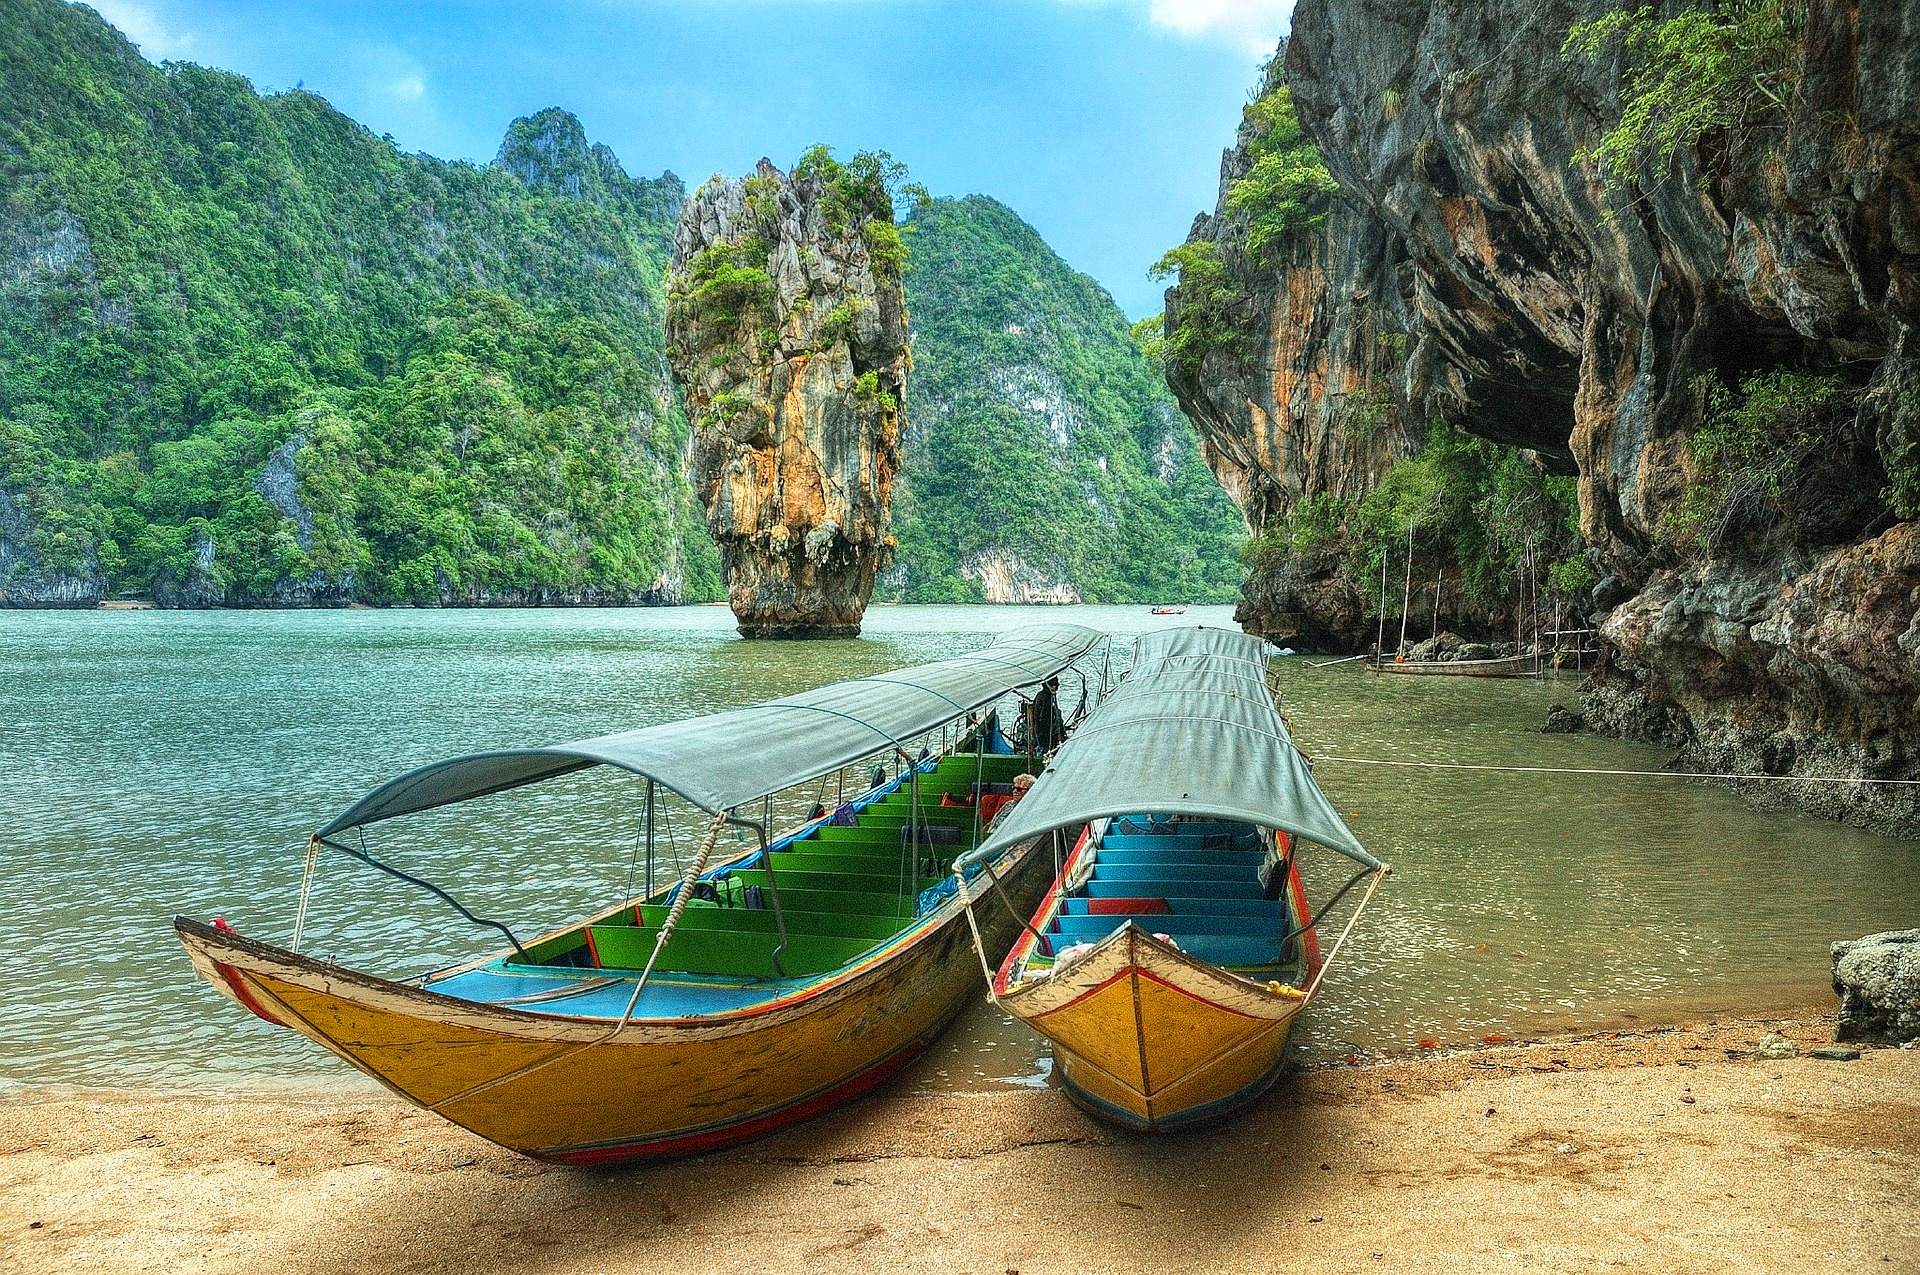 thailand-180828_1920.jpg?1543410395